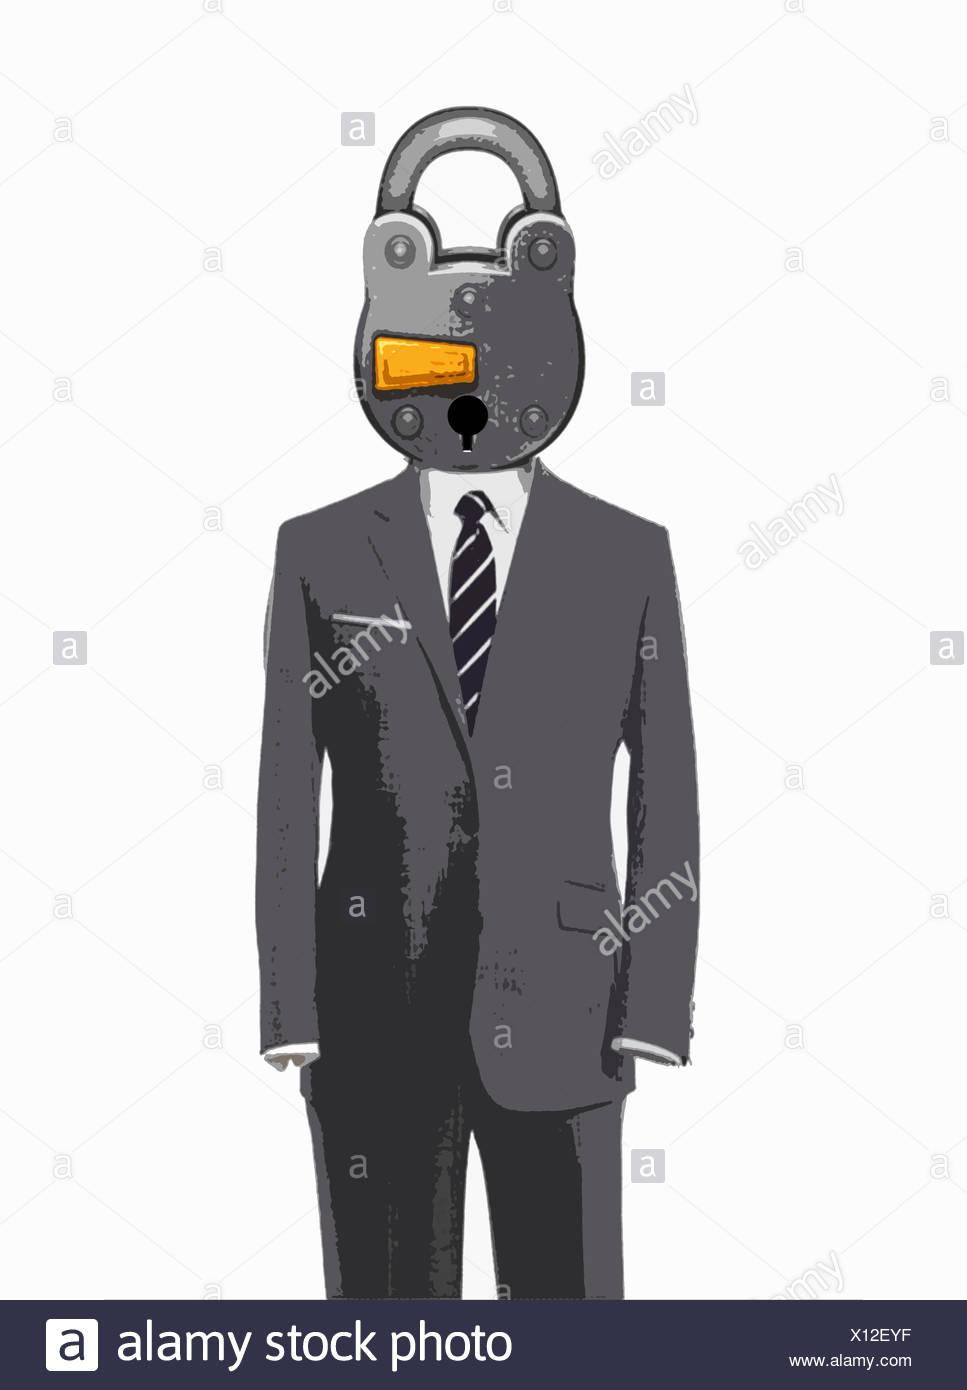 Padlock head on empty business suit - Stock Image